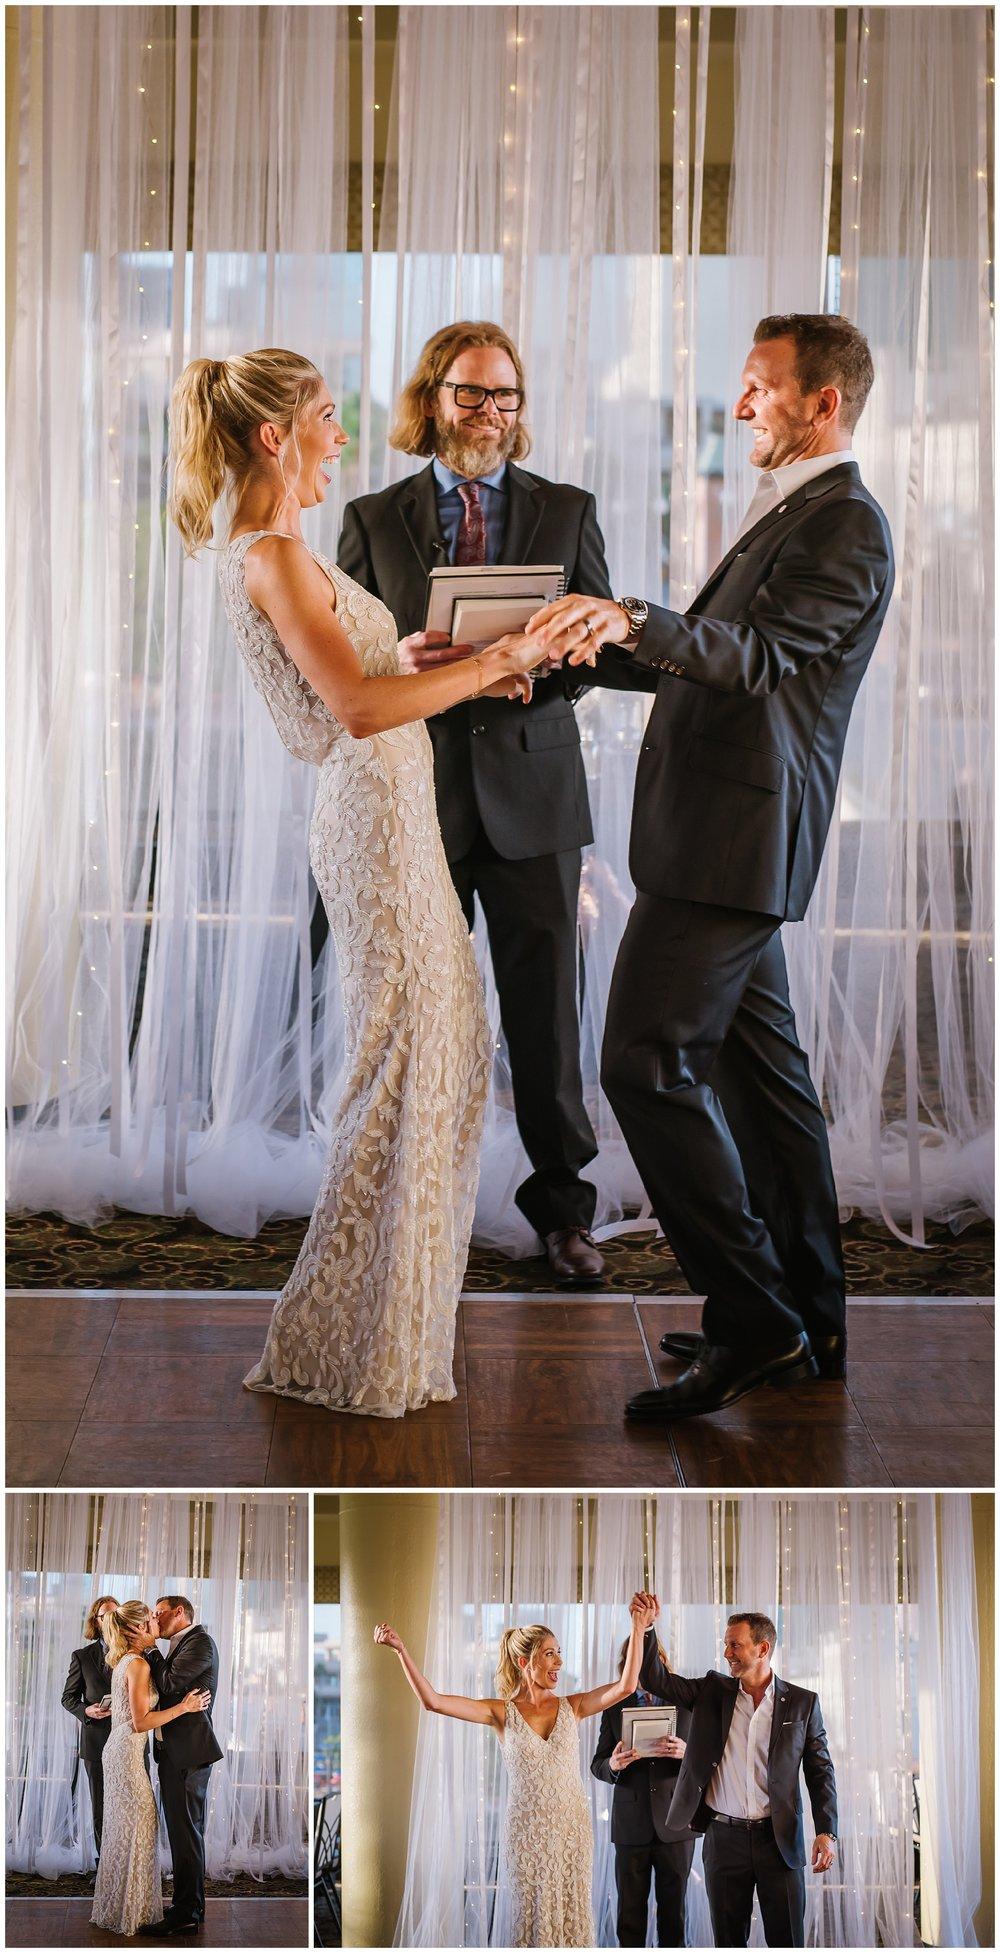 Tampa-wedding-photographer-downtown-bhldn-intimate_0051.jpg